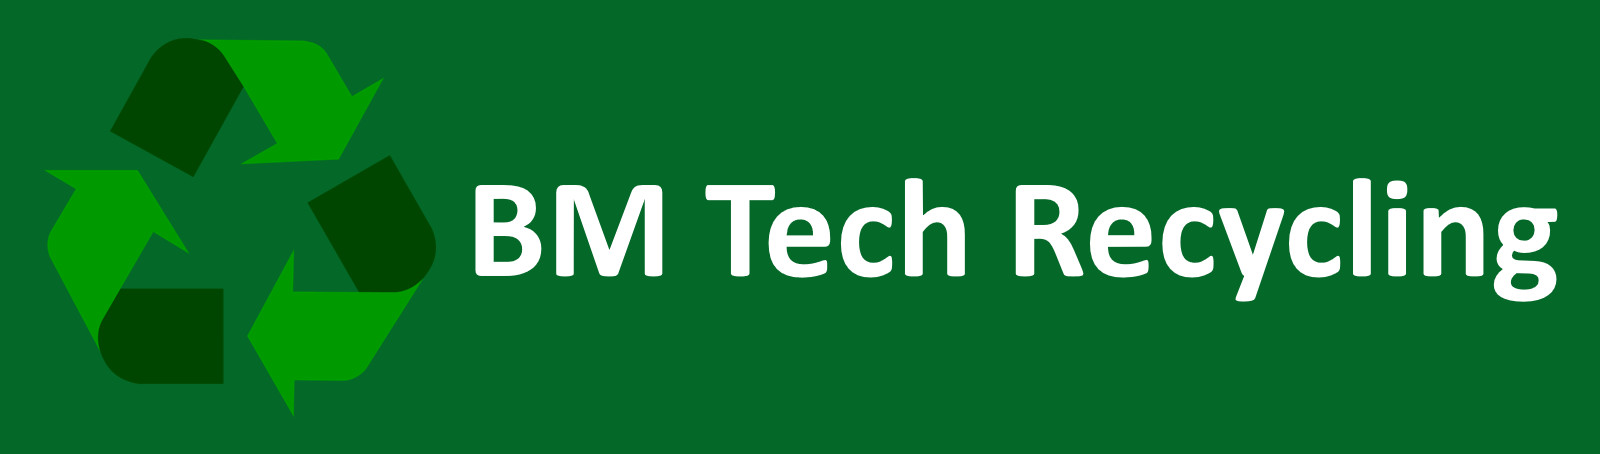 BM Tech Recycling